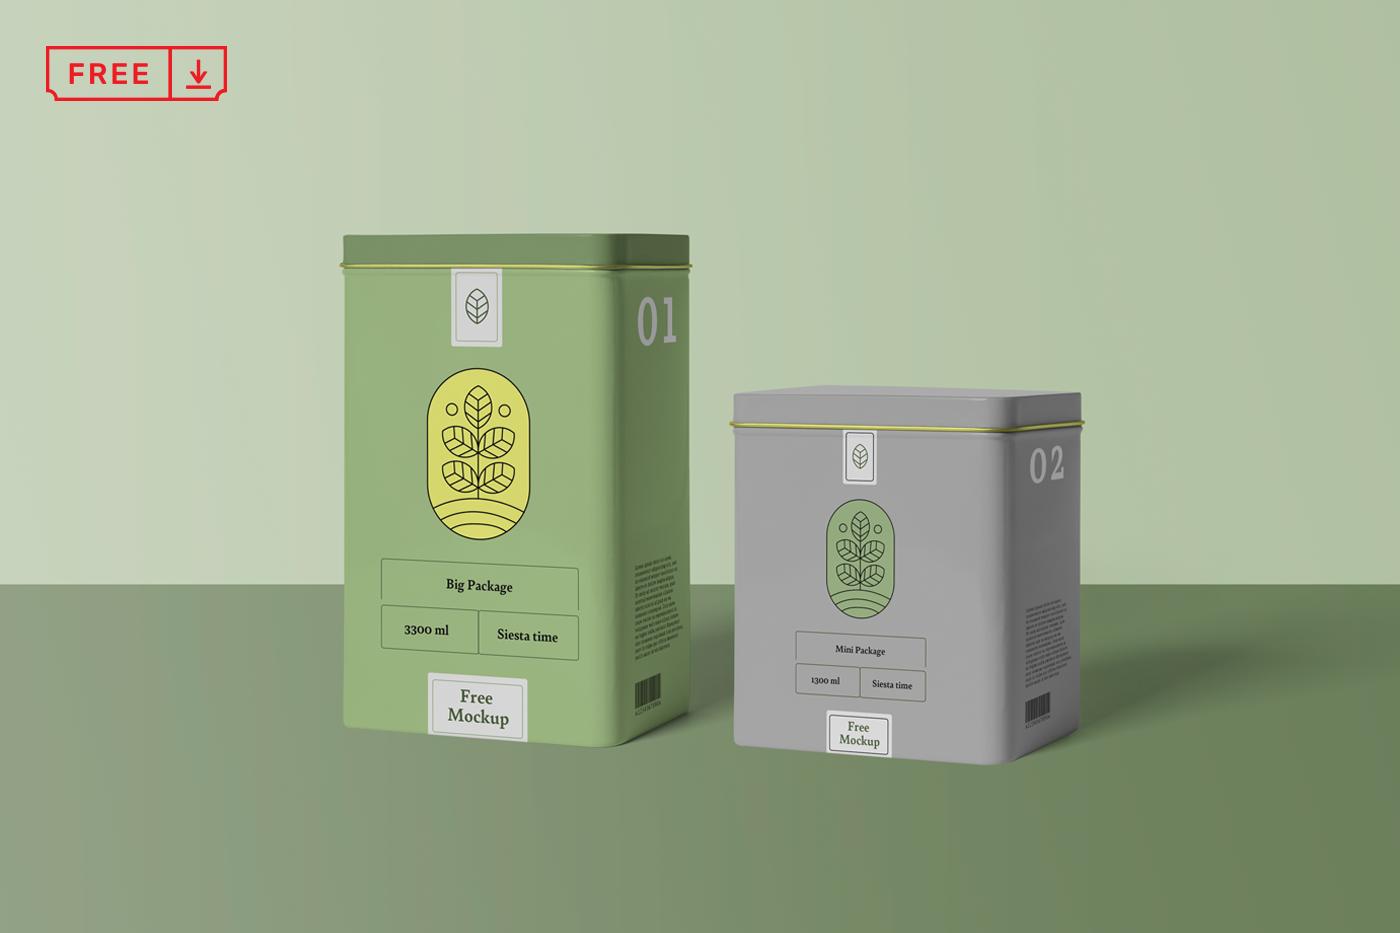 Download Free Psd Mockups Vol 10 On Behance Graphic Design Freebies Box Mockup Design Freebie